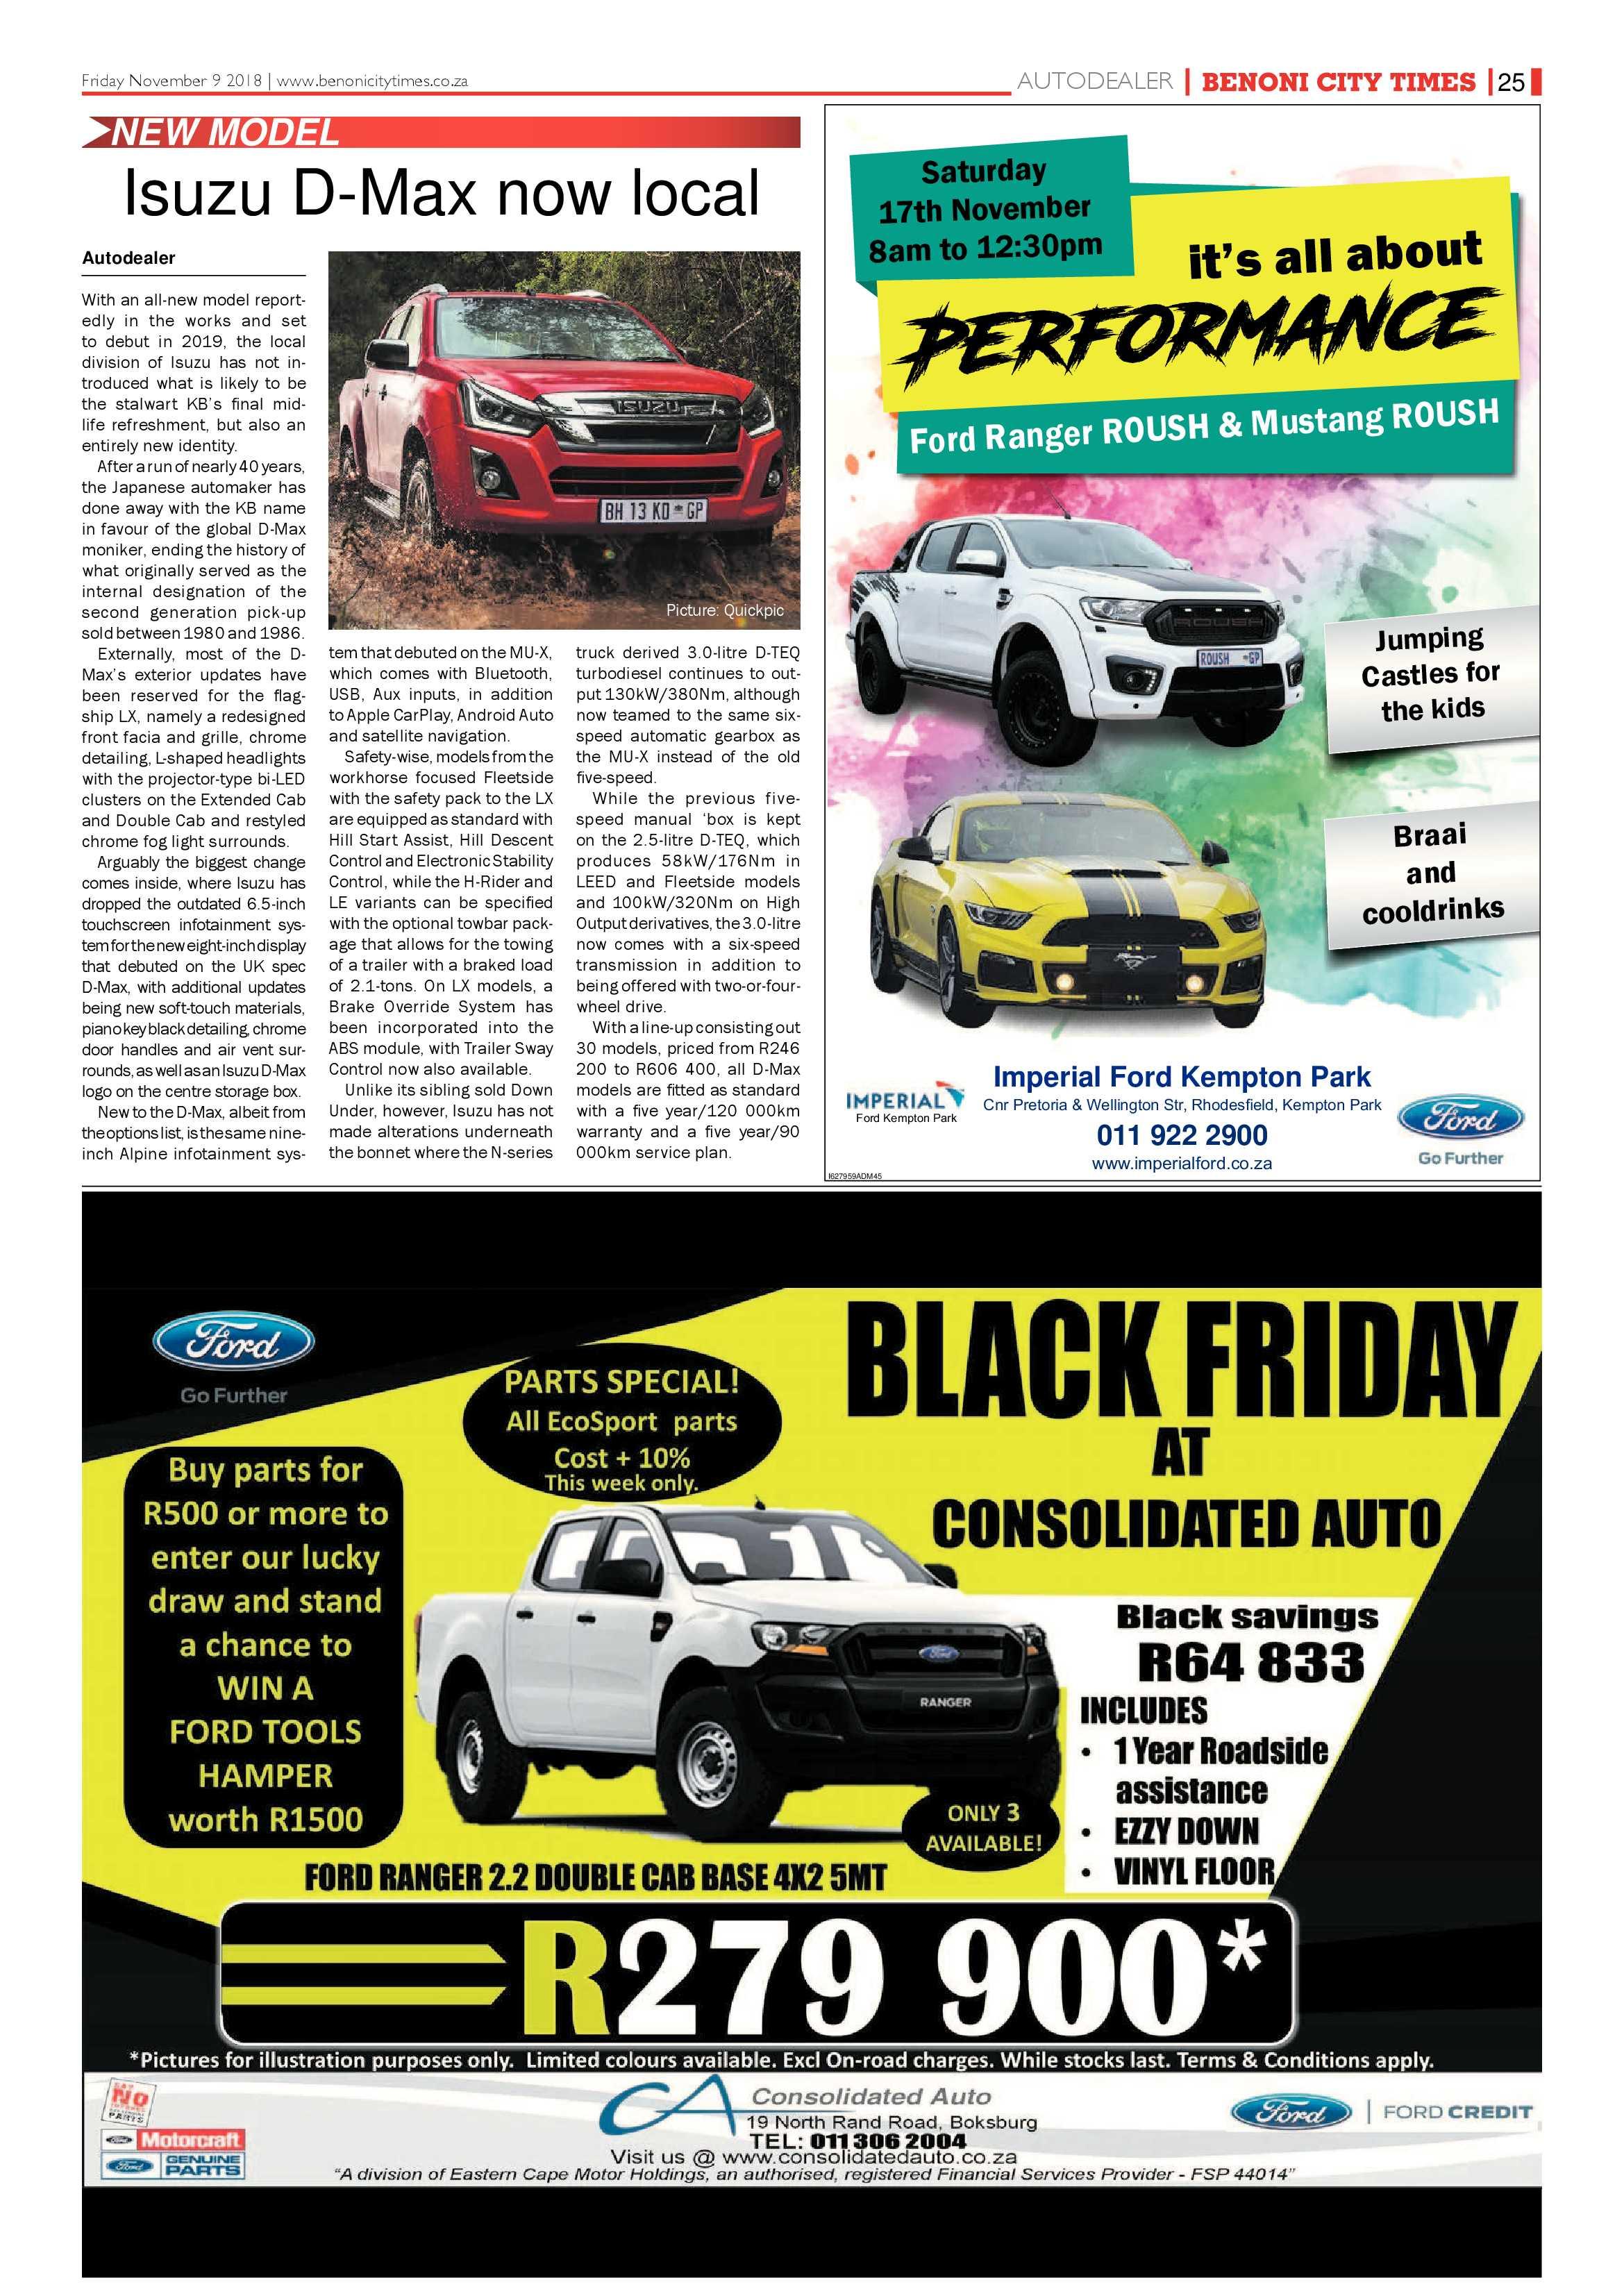 benoni-city-times-08-november-2018-epapers-page-25